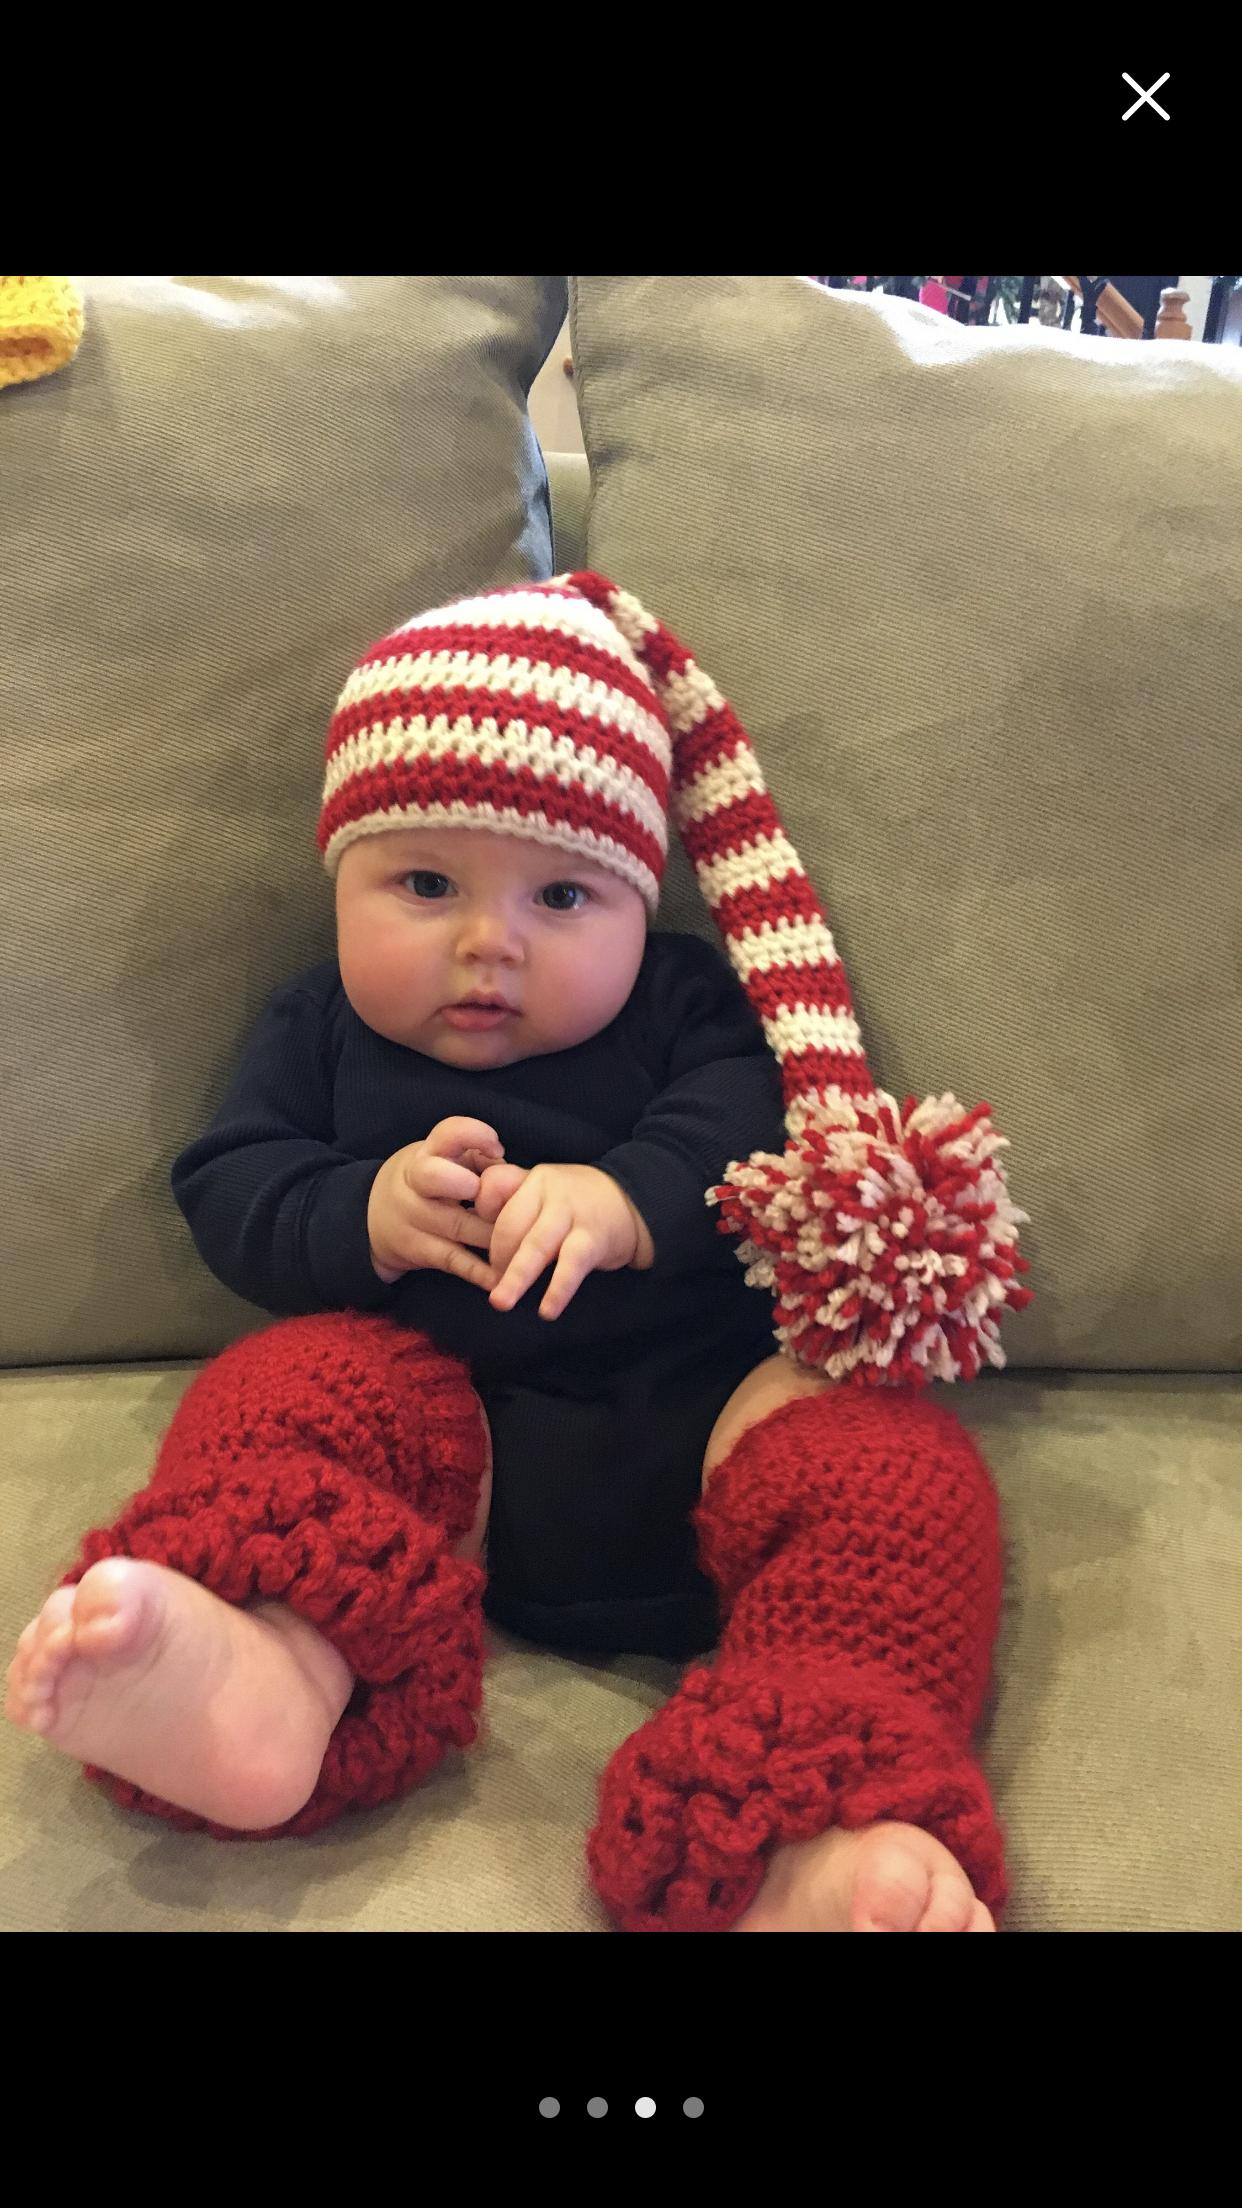 Elf Newborn Hat Photography prop Newborn Baby hat Handmade Knitting Crochet Kids Elegant elf hat Photo prop